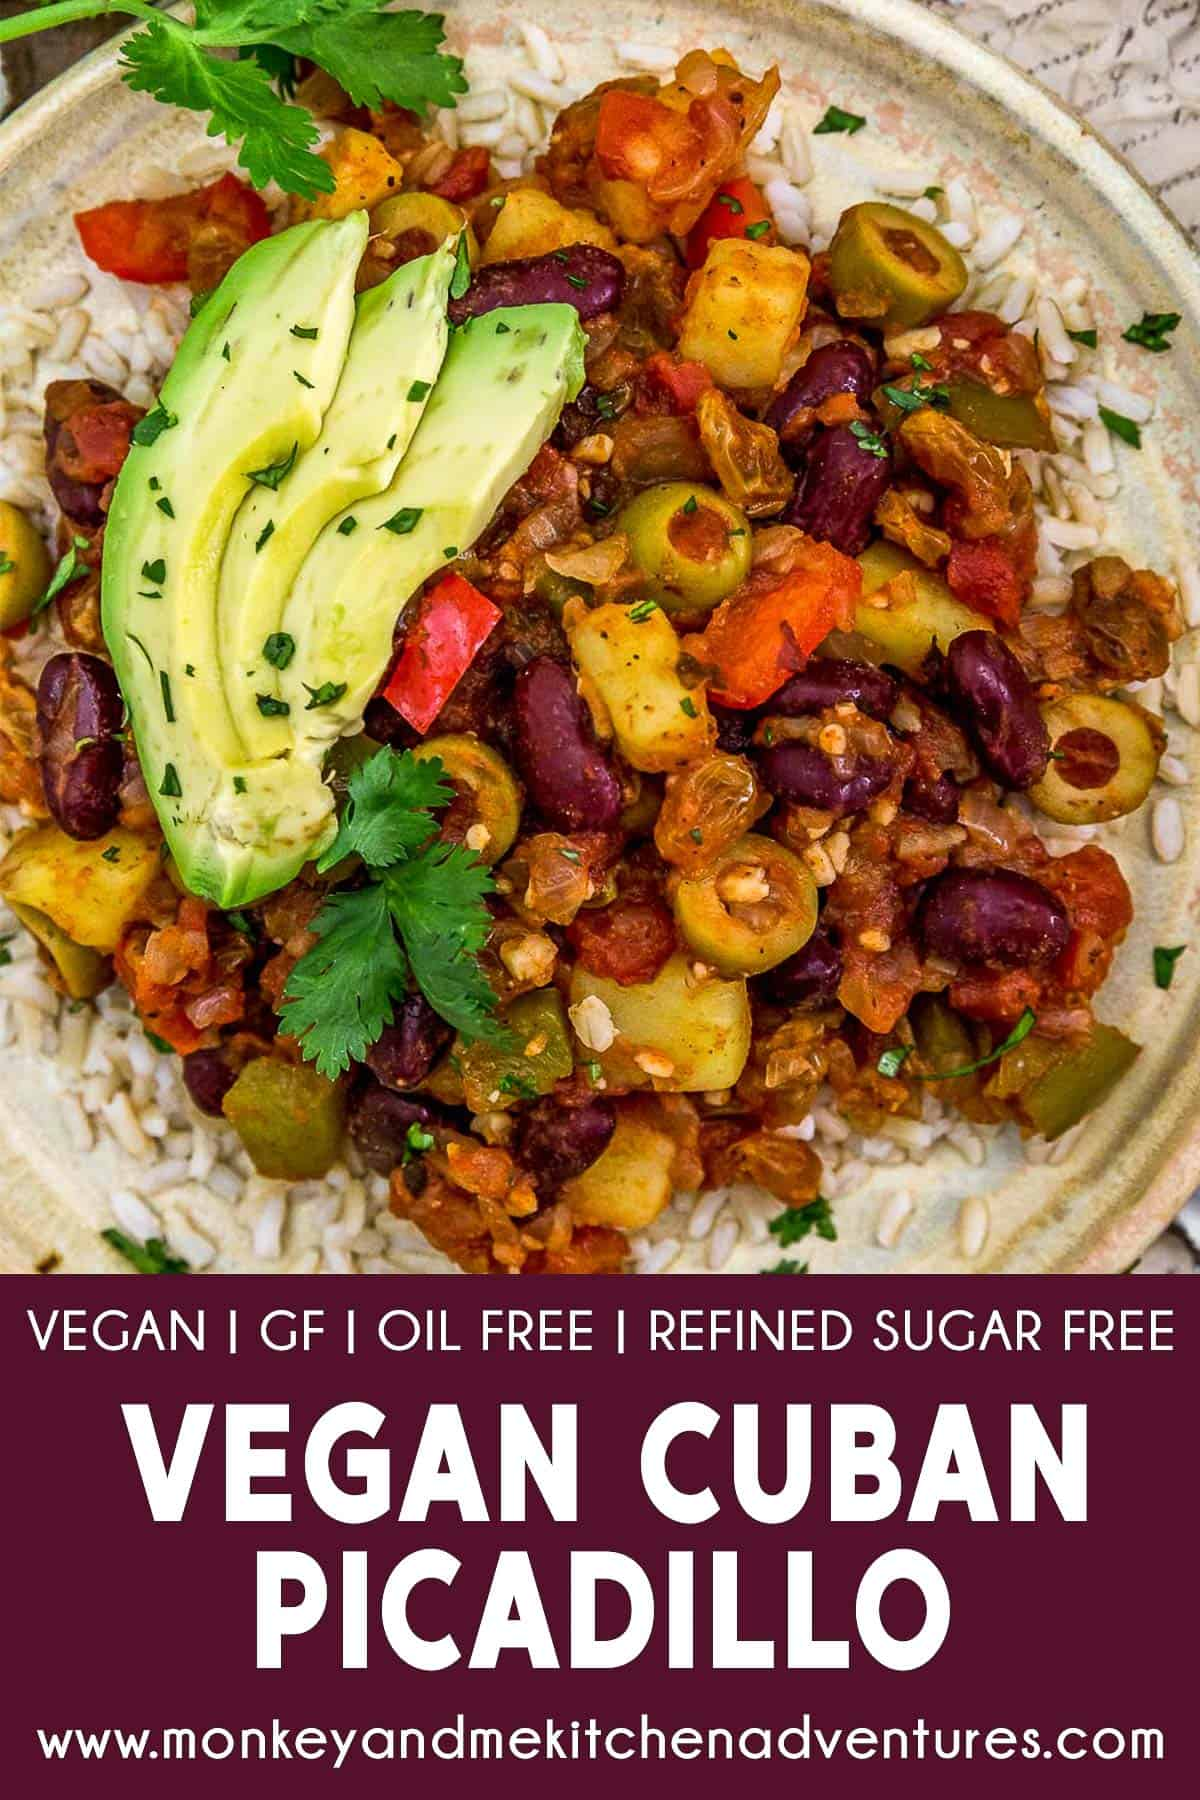 Vegan Cuban Picadillo with text description